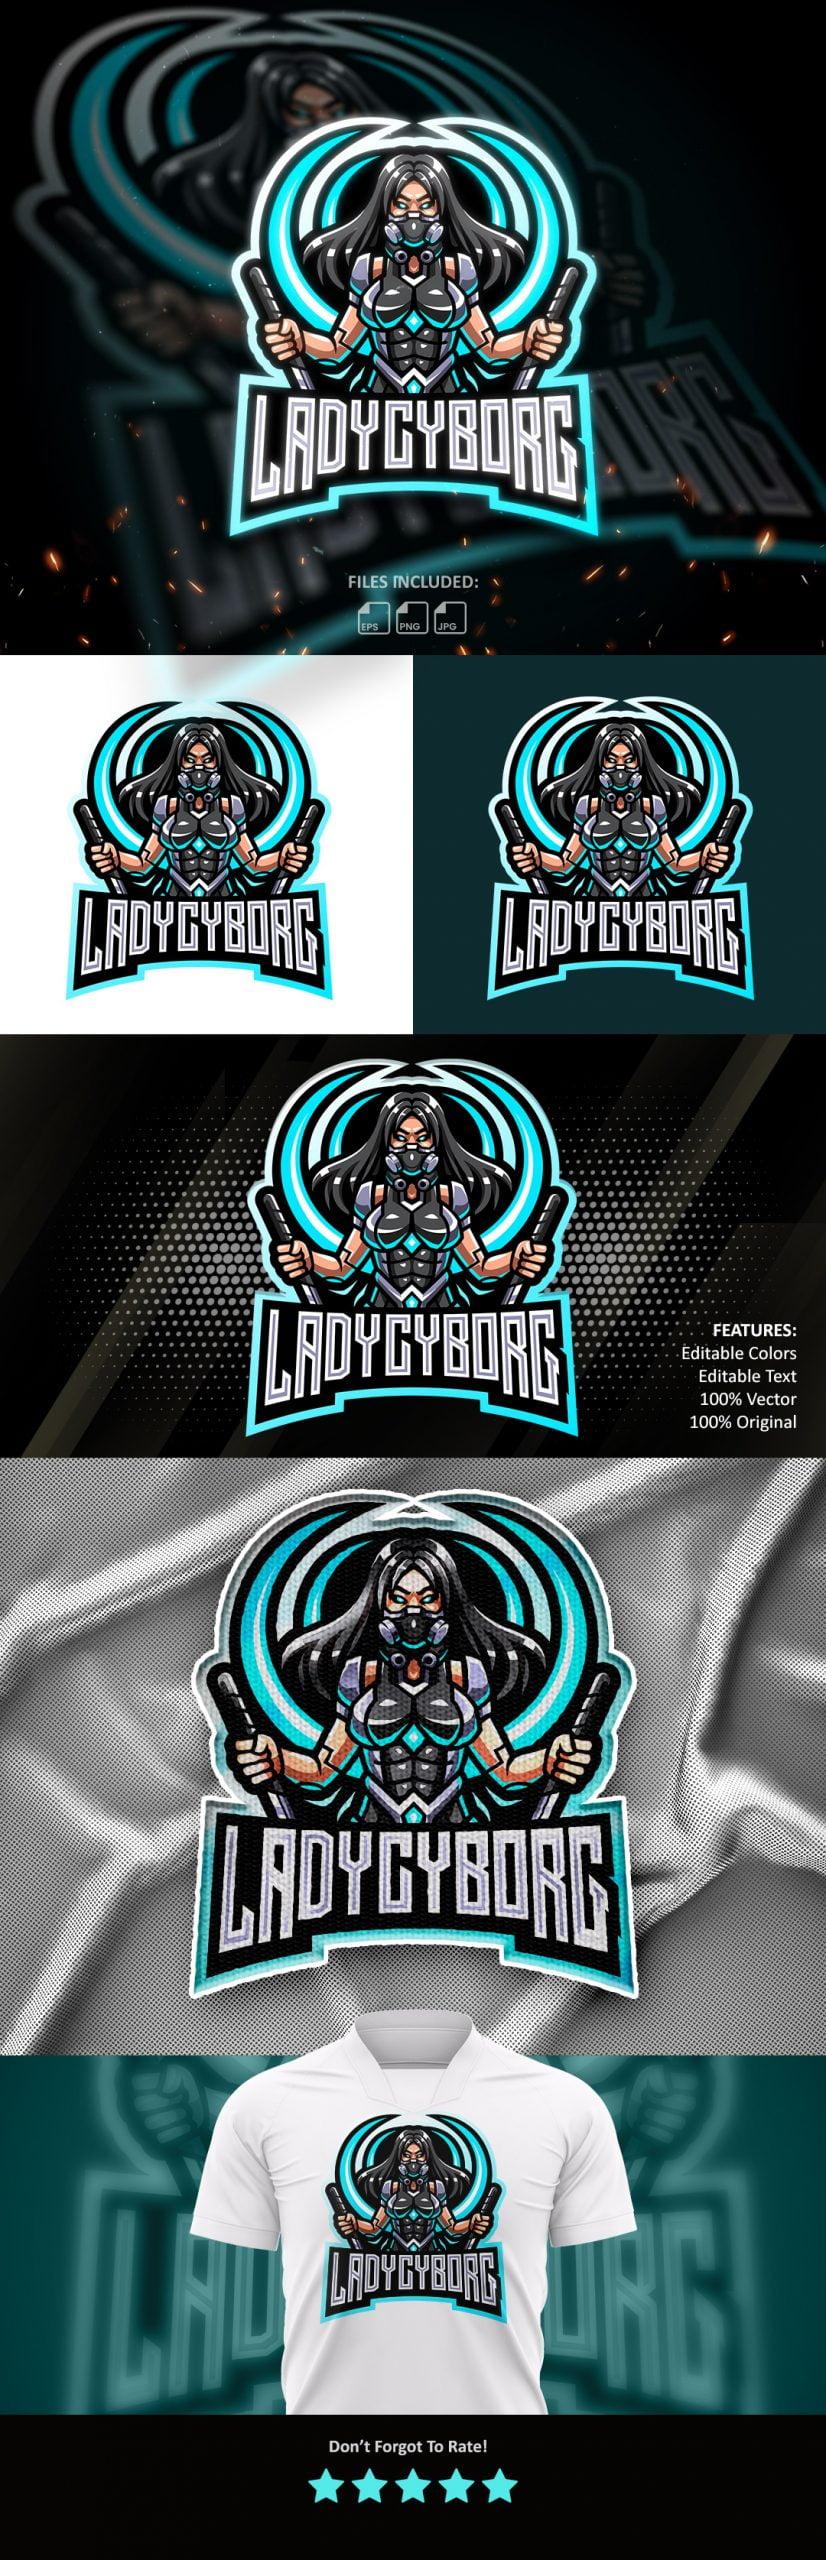 Lady Cyborg Esports Mascot Logo Template